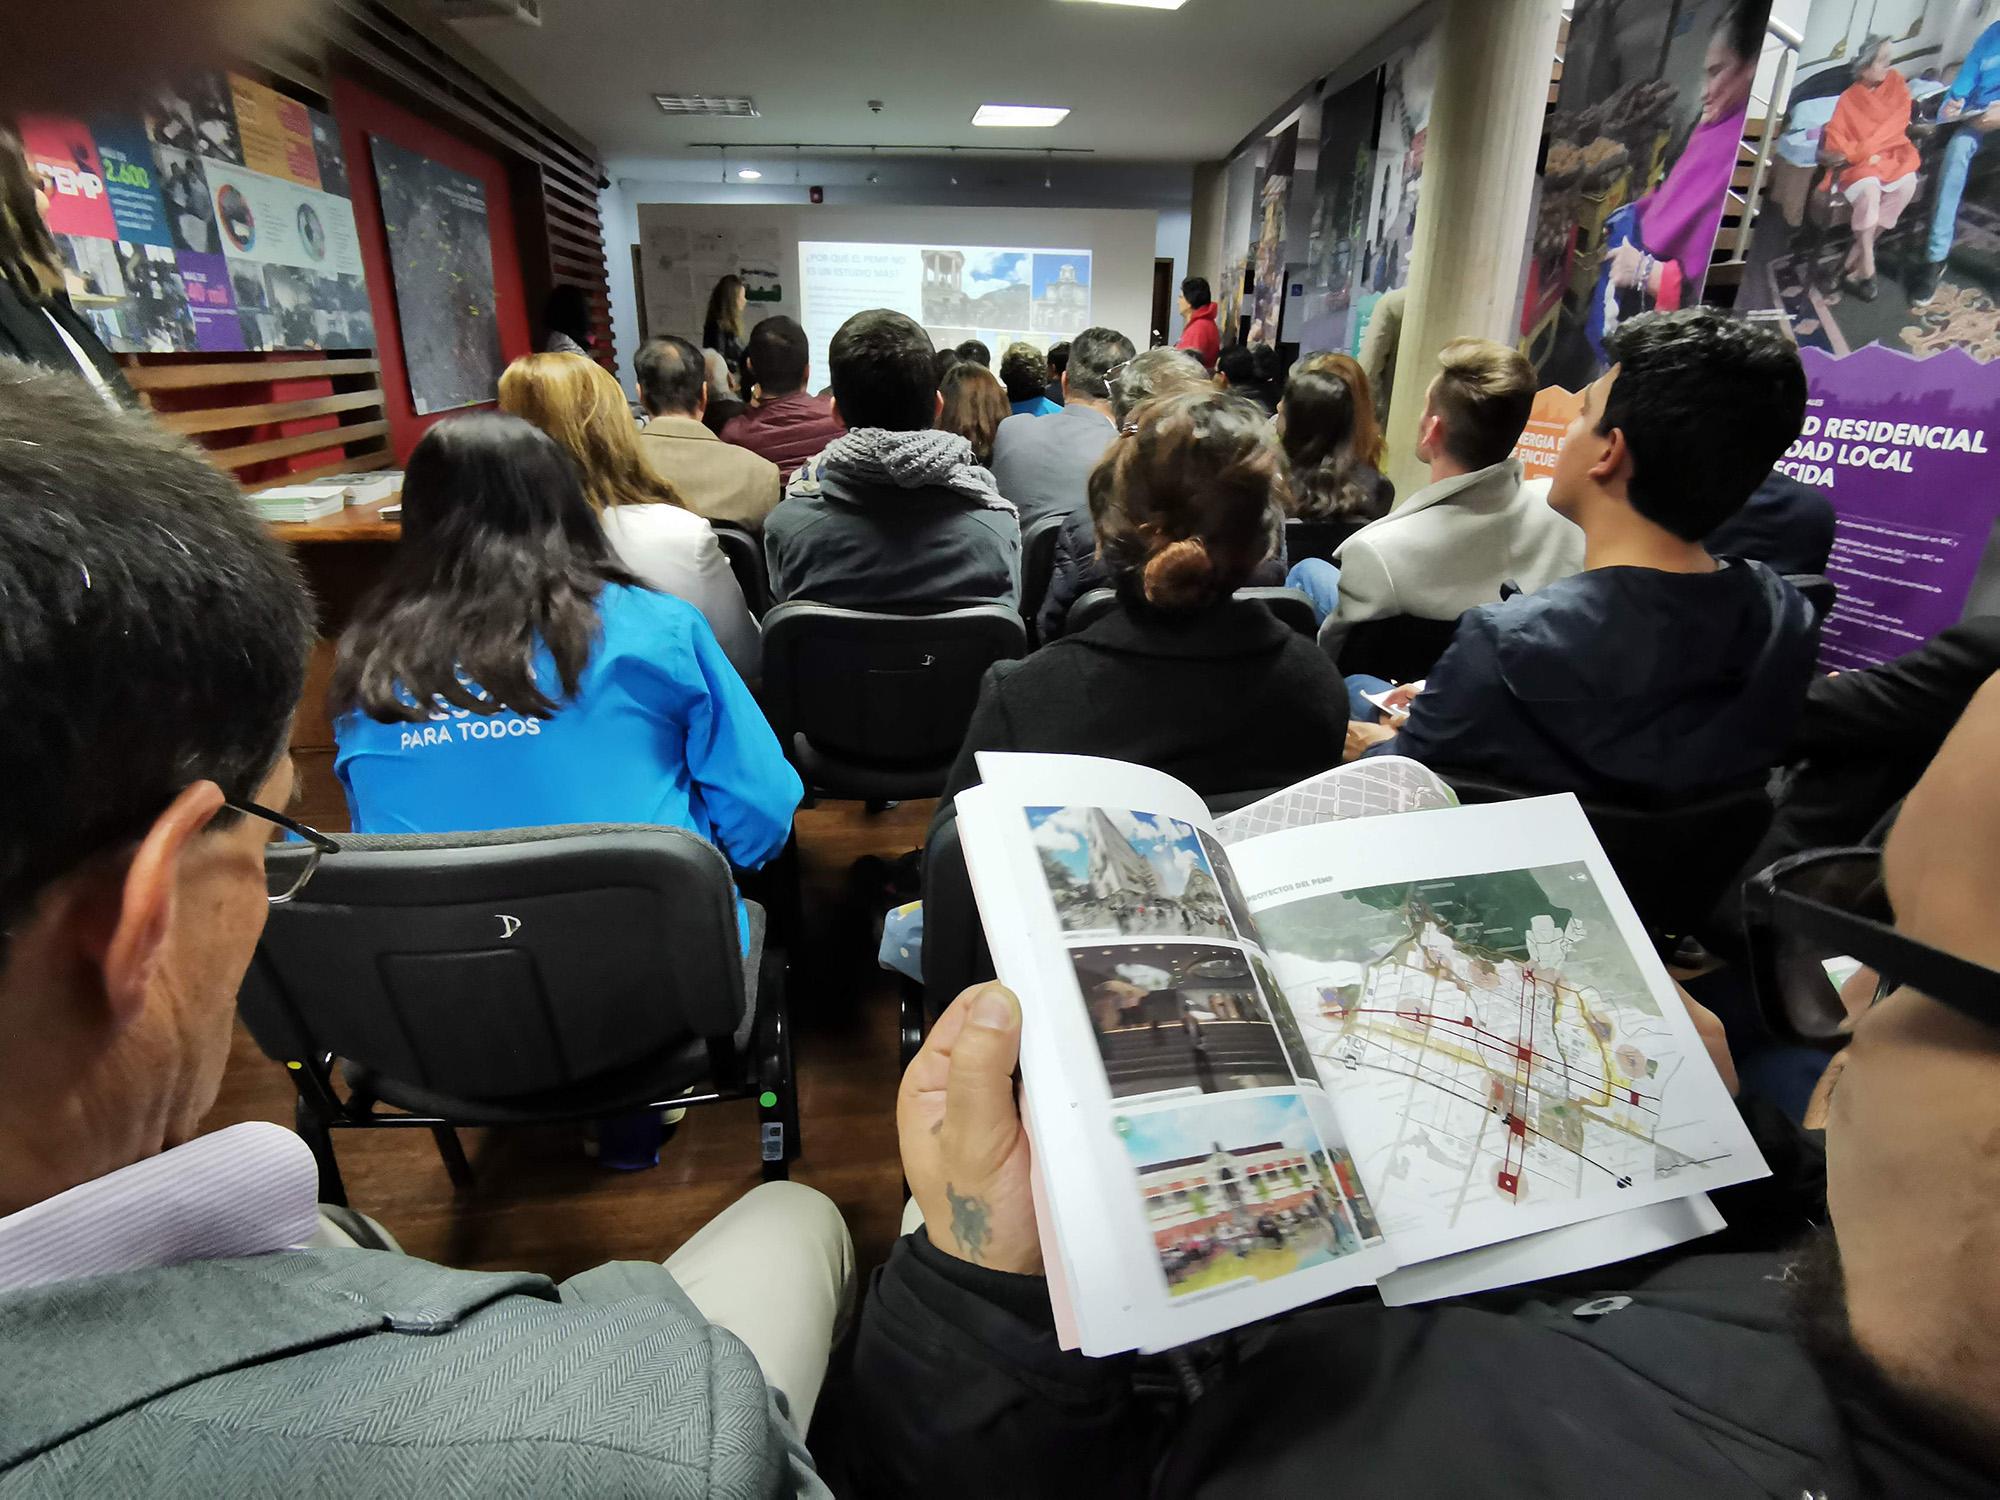 IDPC - Pemp Centro Histórico 2021 - Casa Abierta 1